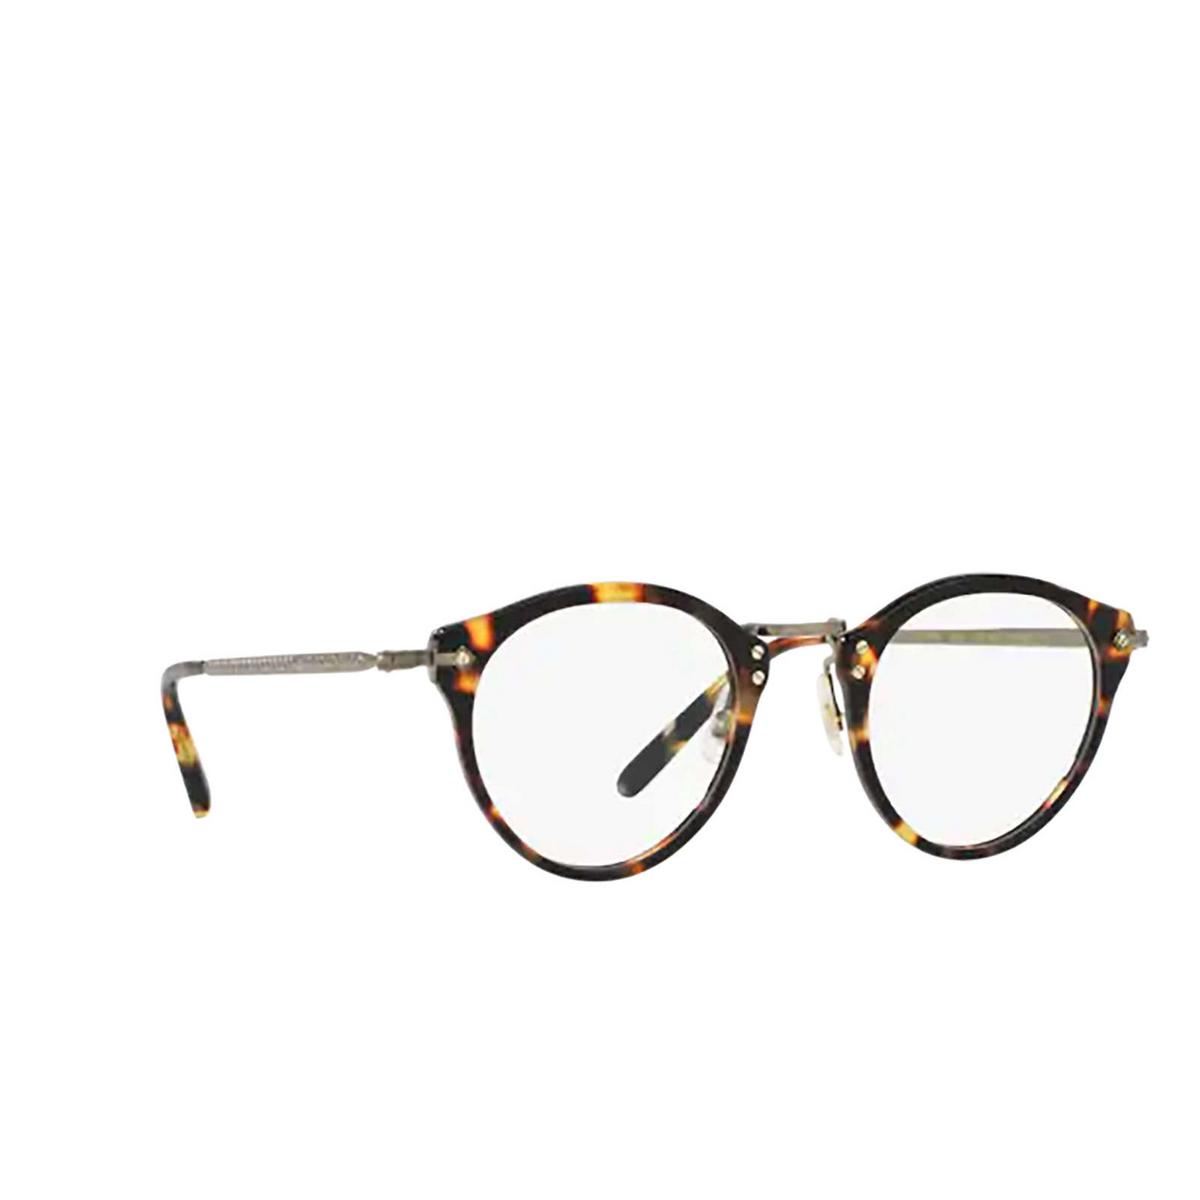 Oliver Peoples® Round Eyeglasses: Op-505 OV5184 color Vintage Dtb 1407 - three-quarters view.